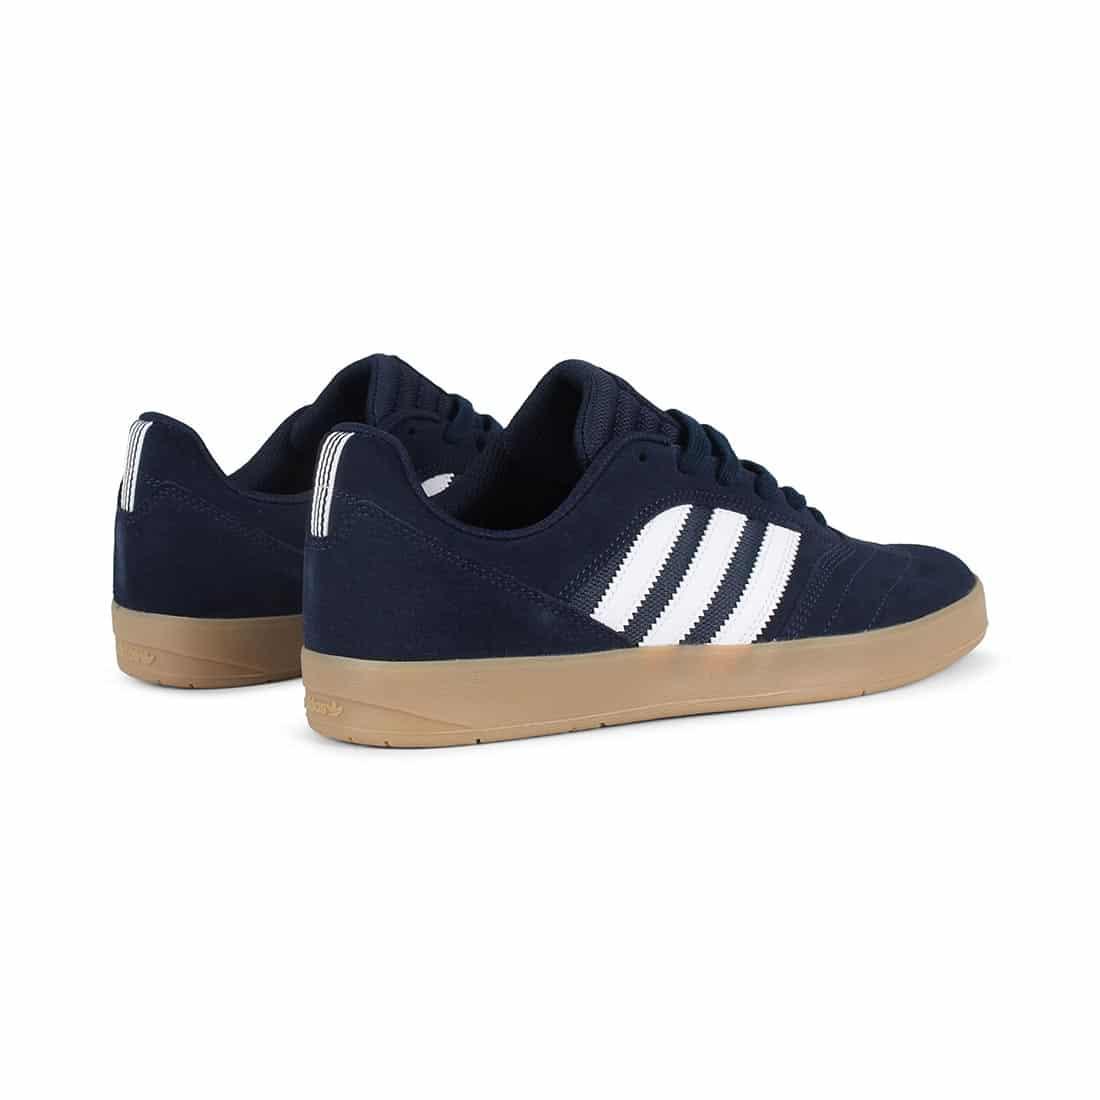 Adidas Suciu ADV II Shoes - Collegiate Navy / White / Gum